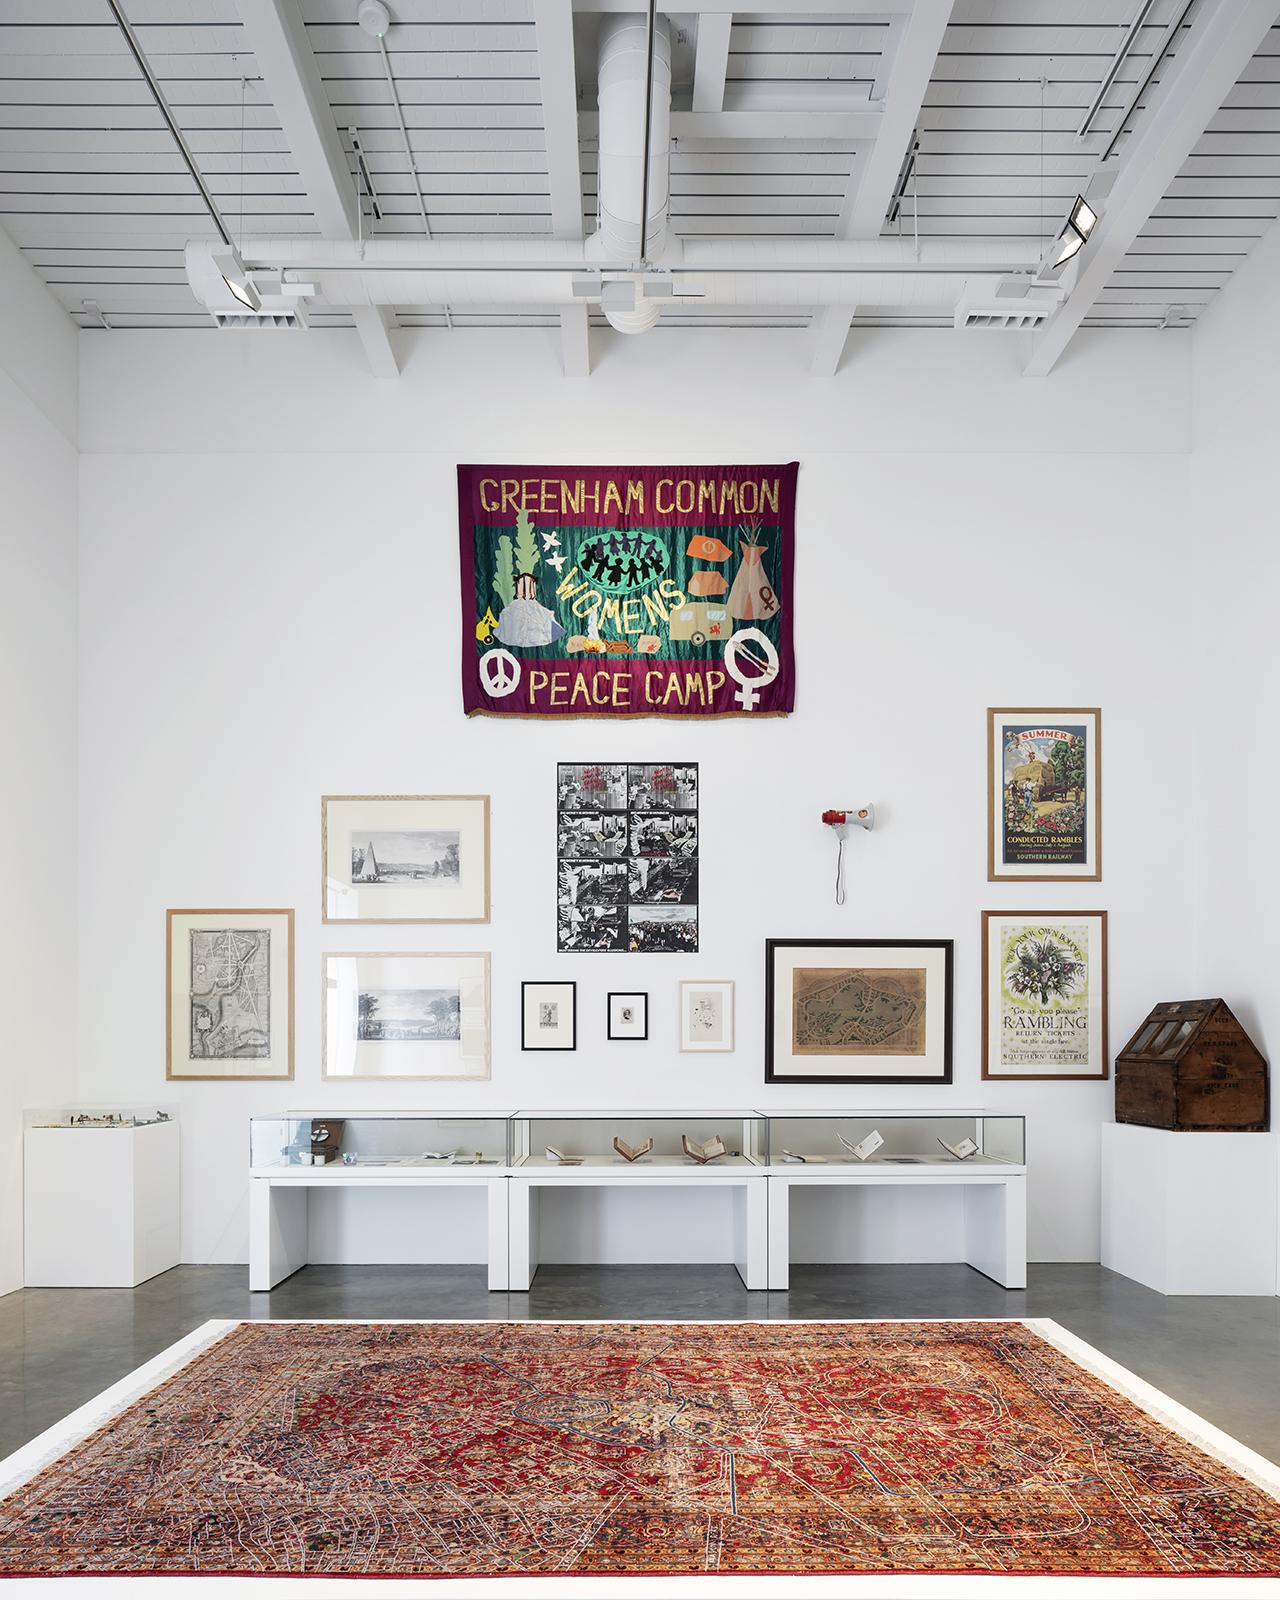 38_MK-Gallery-photo-Johan Dehlin.jpg